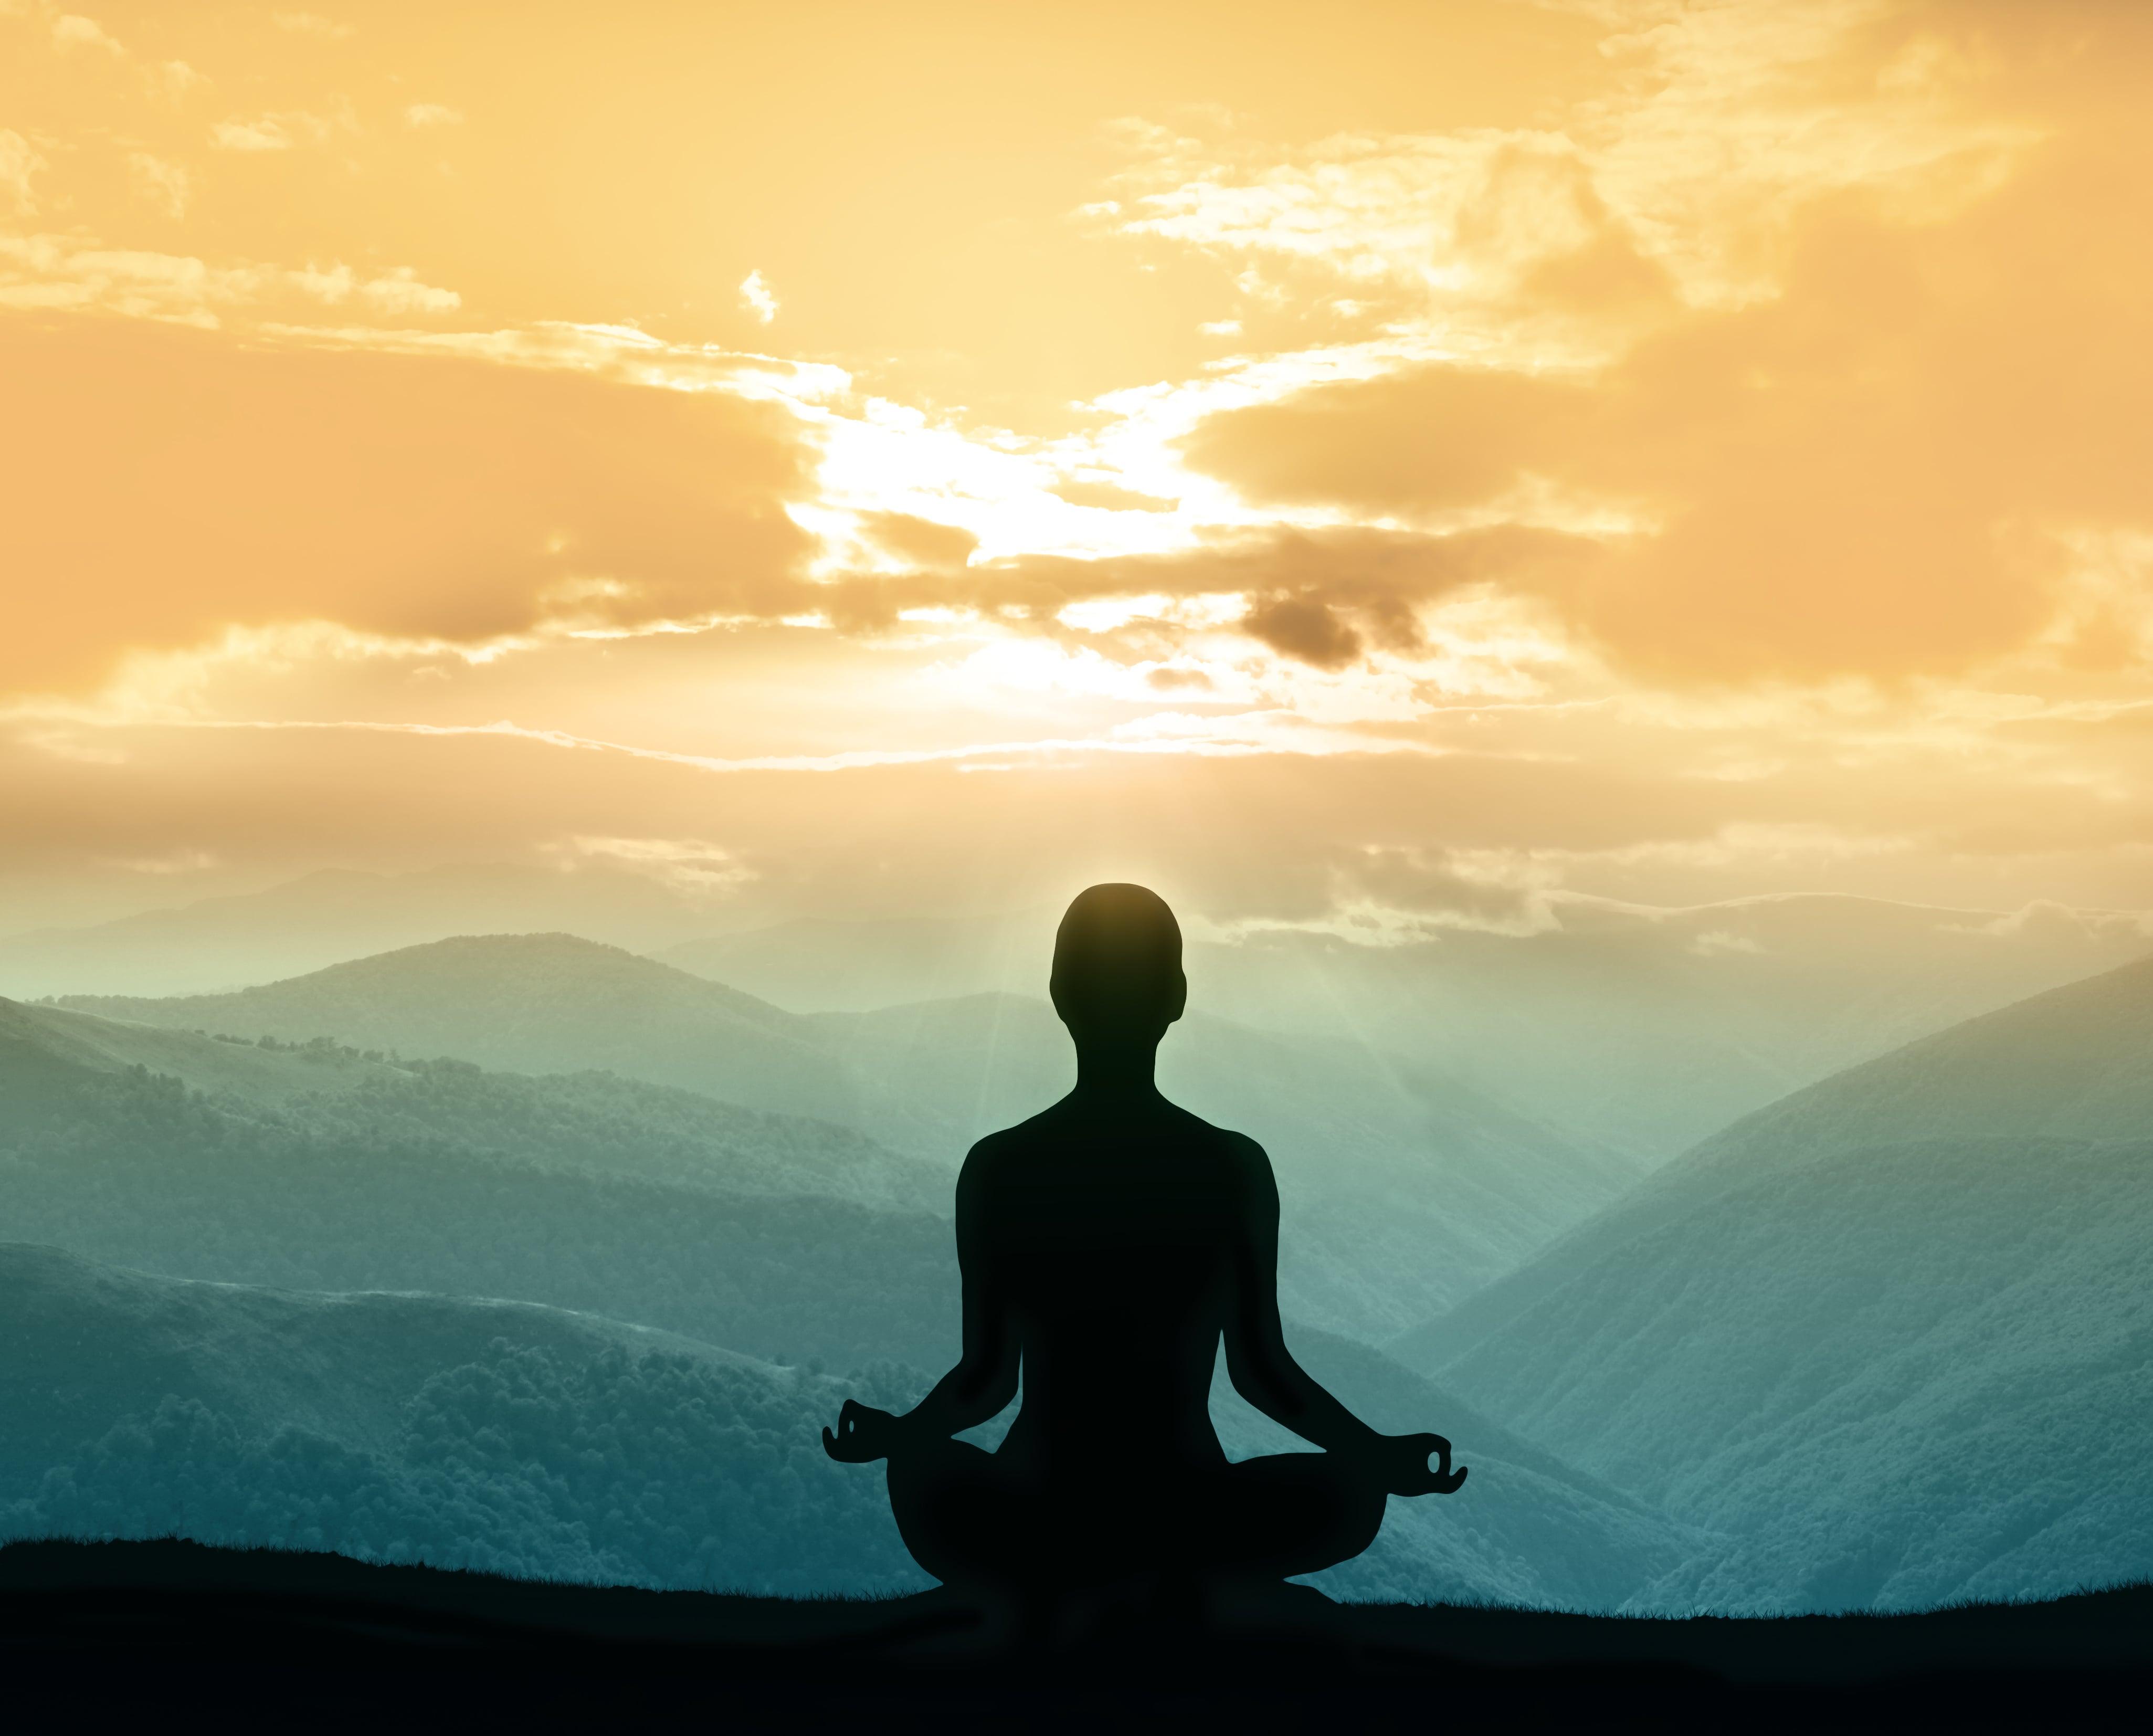 My journey of 330 meditations